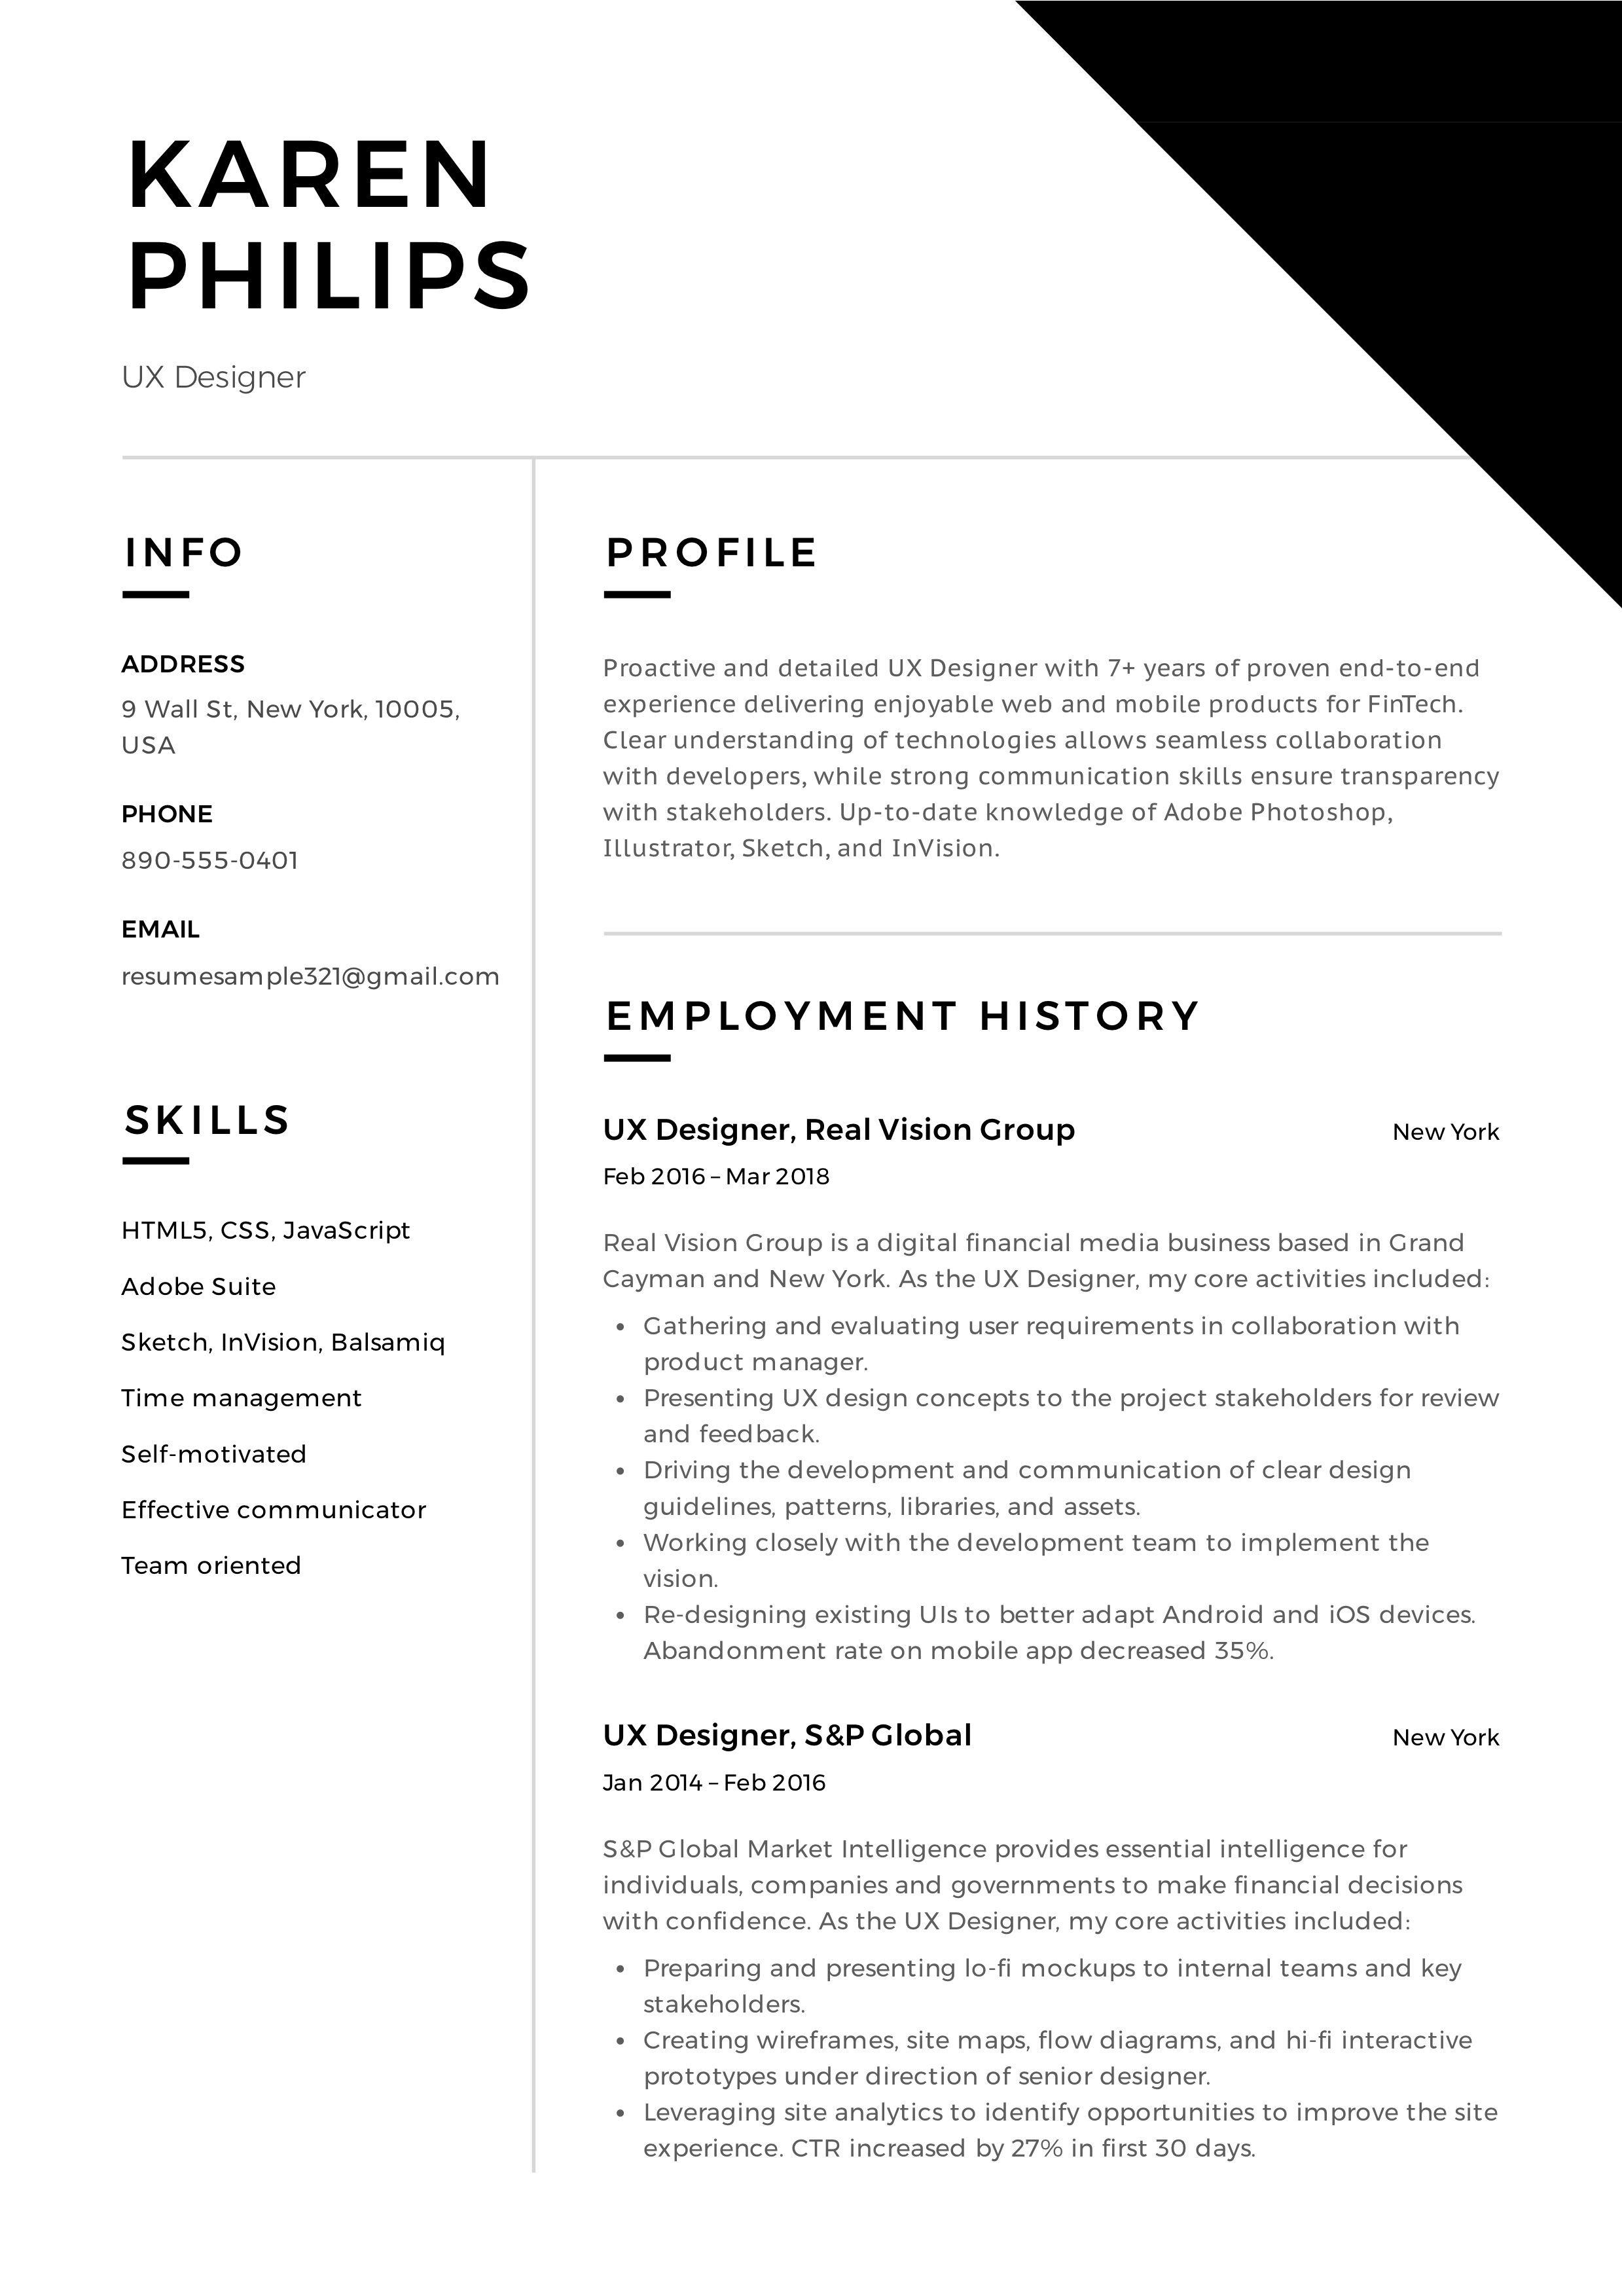 Ux Designer Resume Example Resume Examples Job Resume Examples Basic Resume Examples